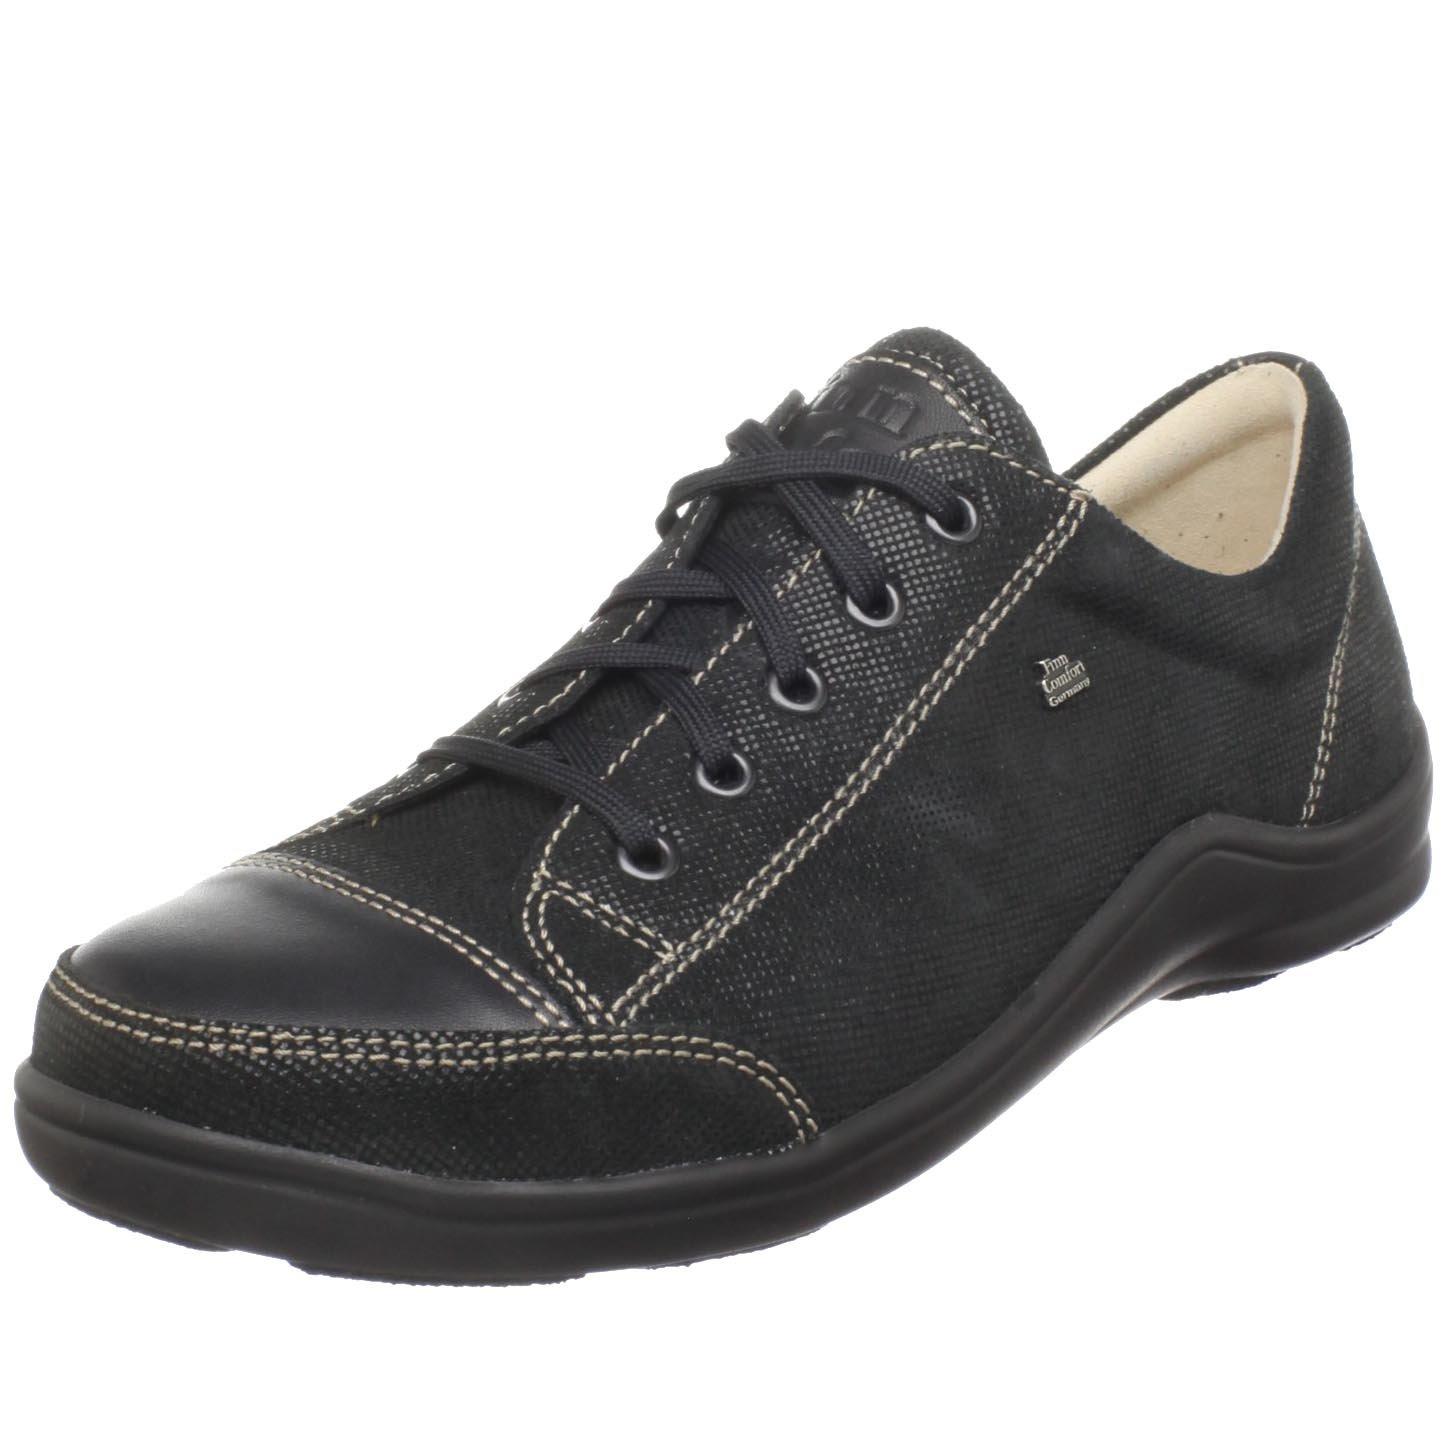 Finn Comfort Women's Soft Soho Fashion Sneaker,Black Minipoints/Nappa,40 M EU / 9 B(M)